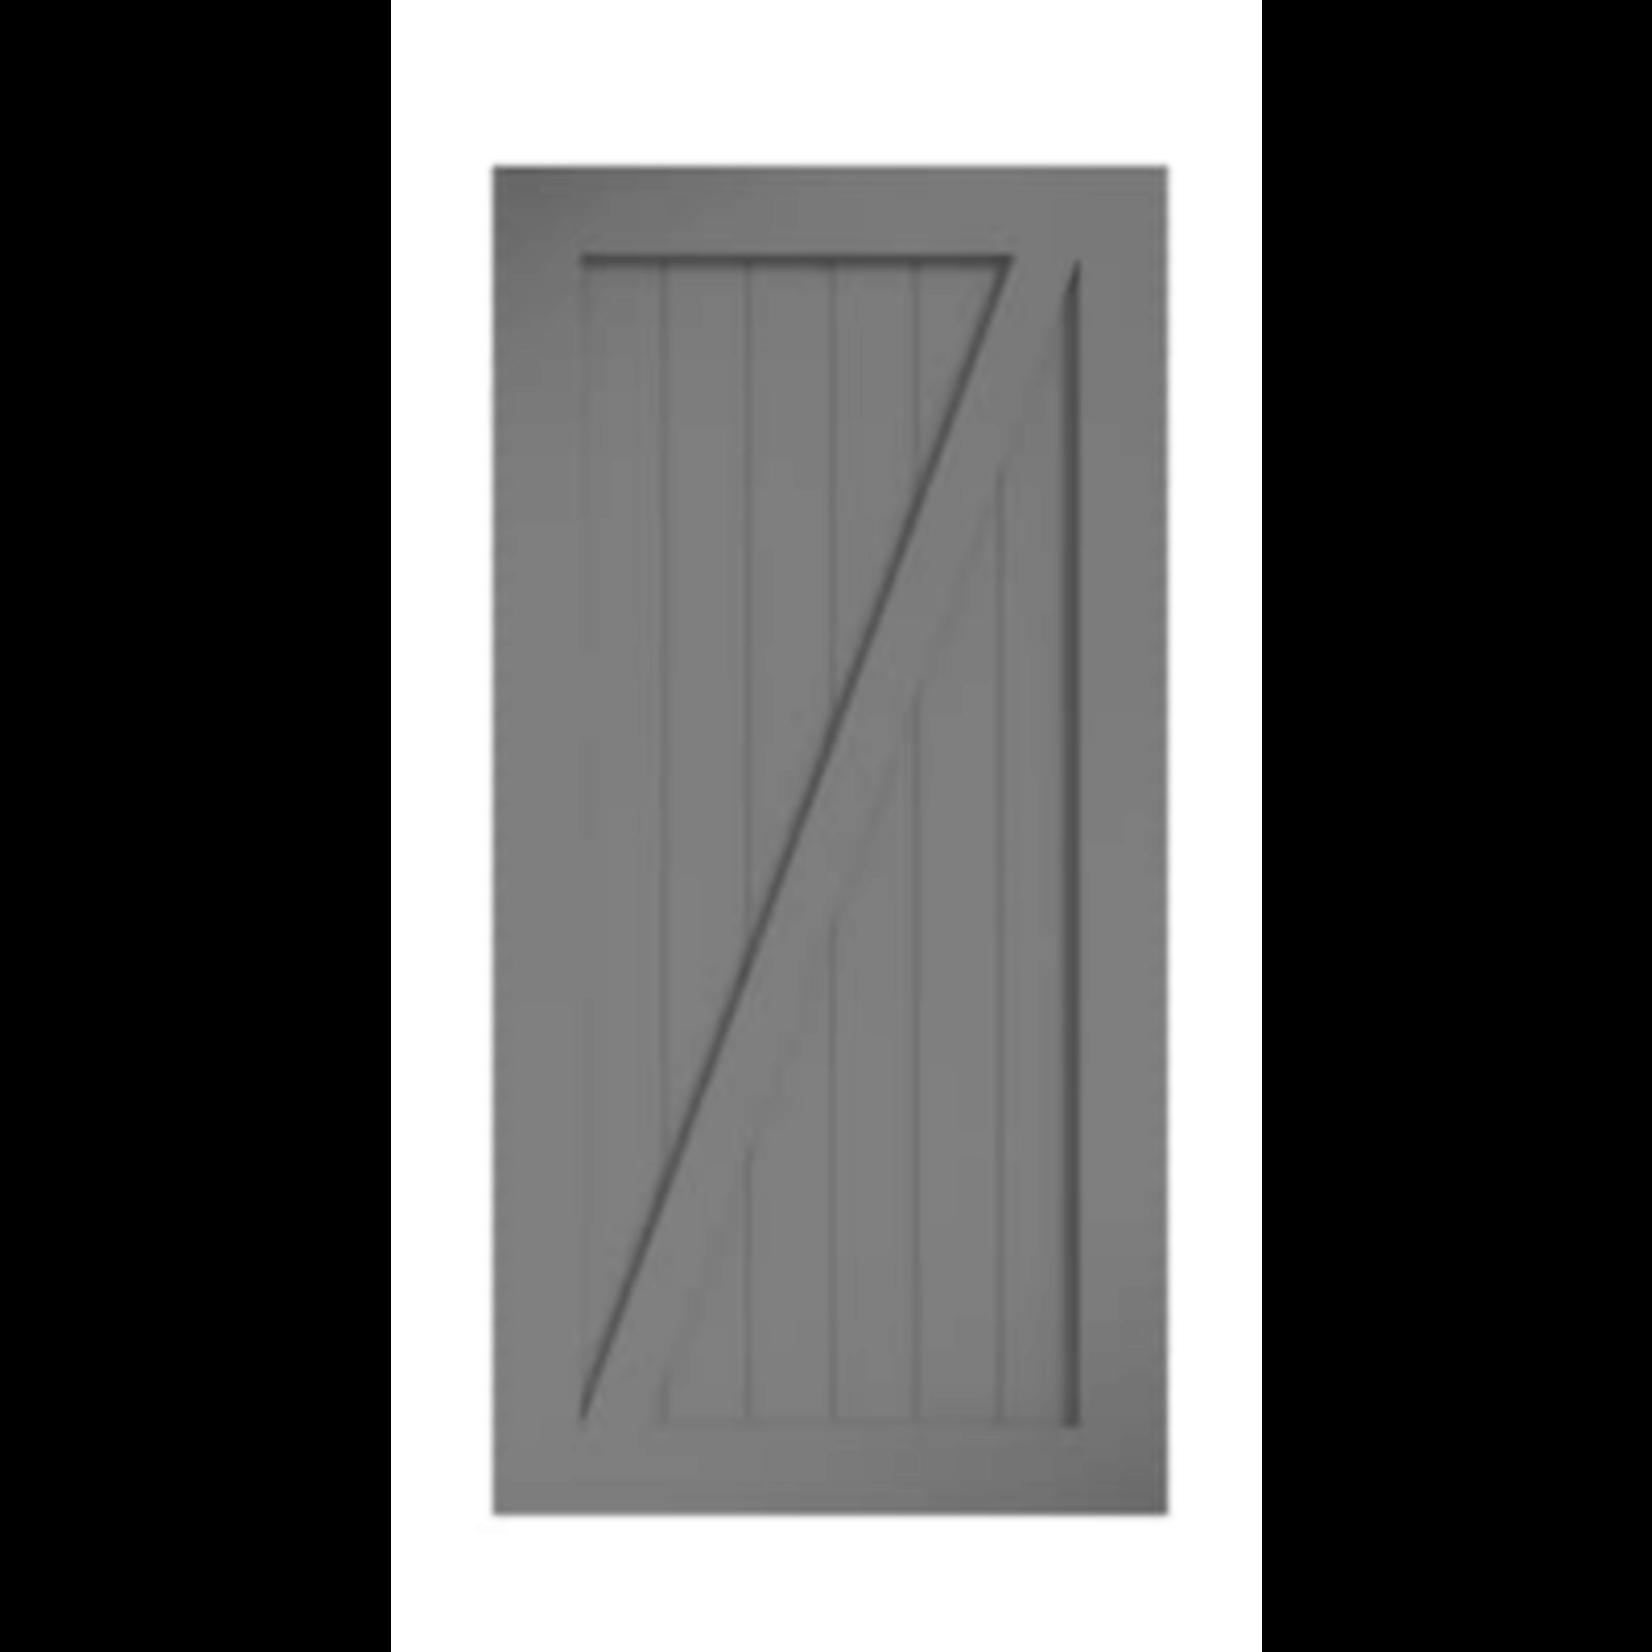 4052 EightDoors Gray 1-Panel Prefinished Pinewood Barn Door